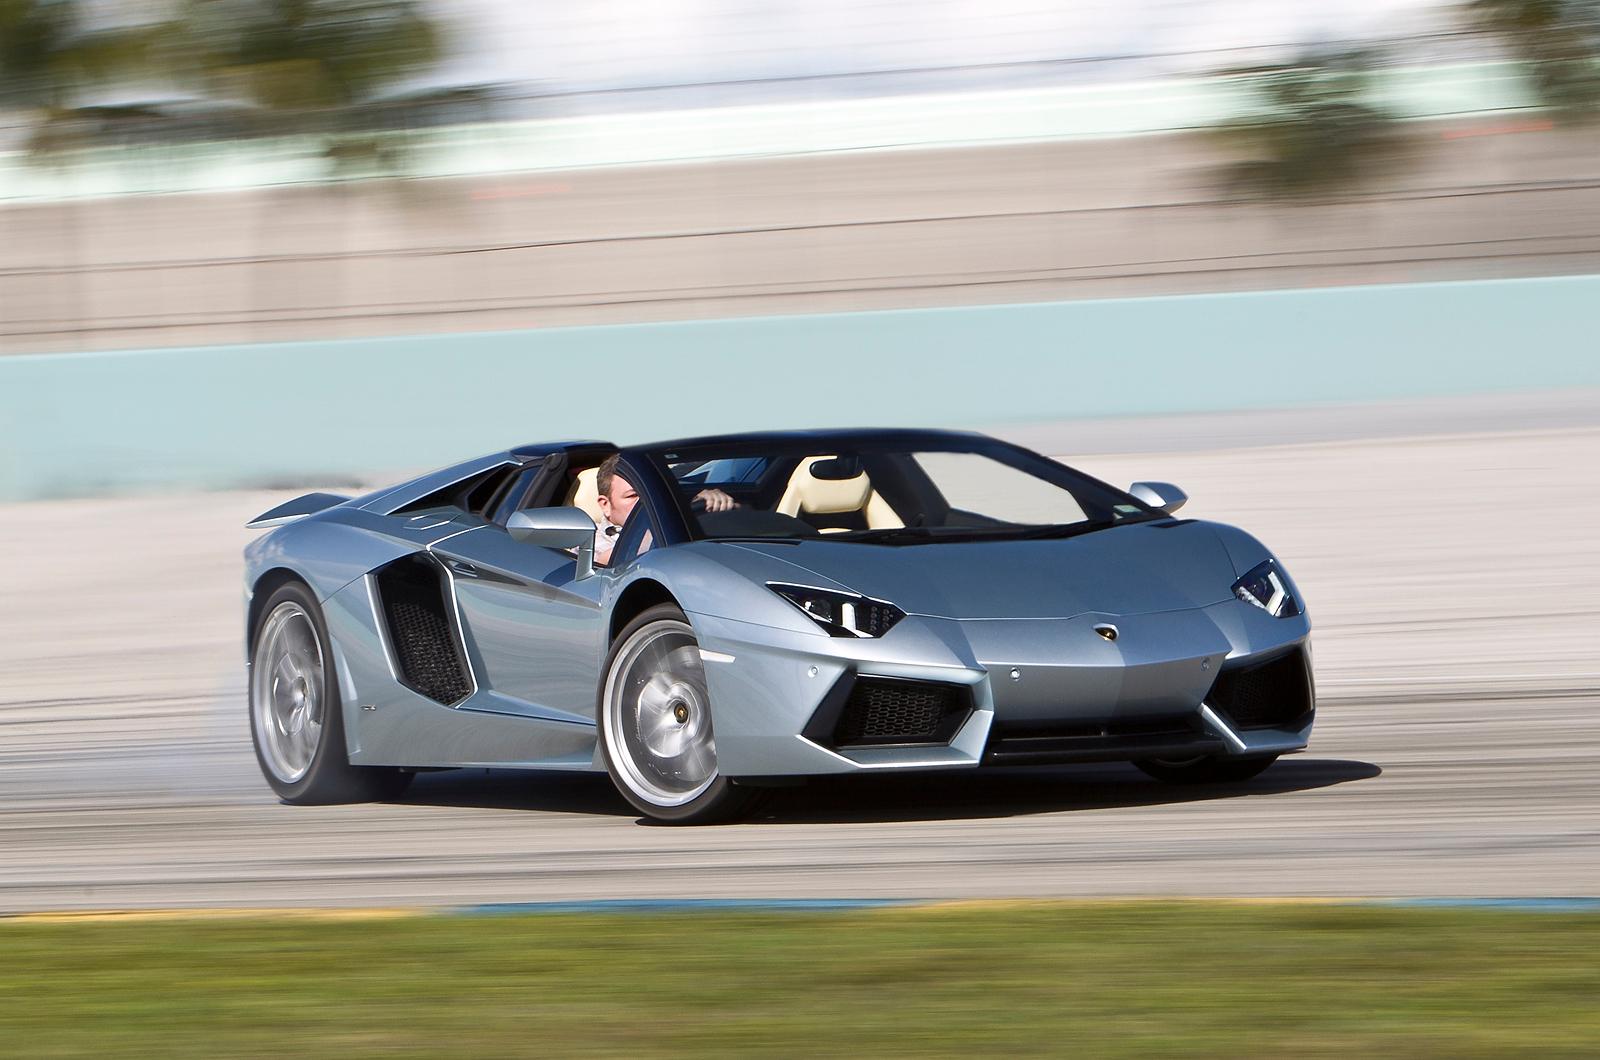 Silver Lamborghini Aventador: 2014 Lamborghini Aventador Roadster Supercar Silver E